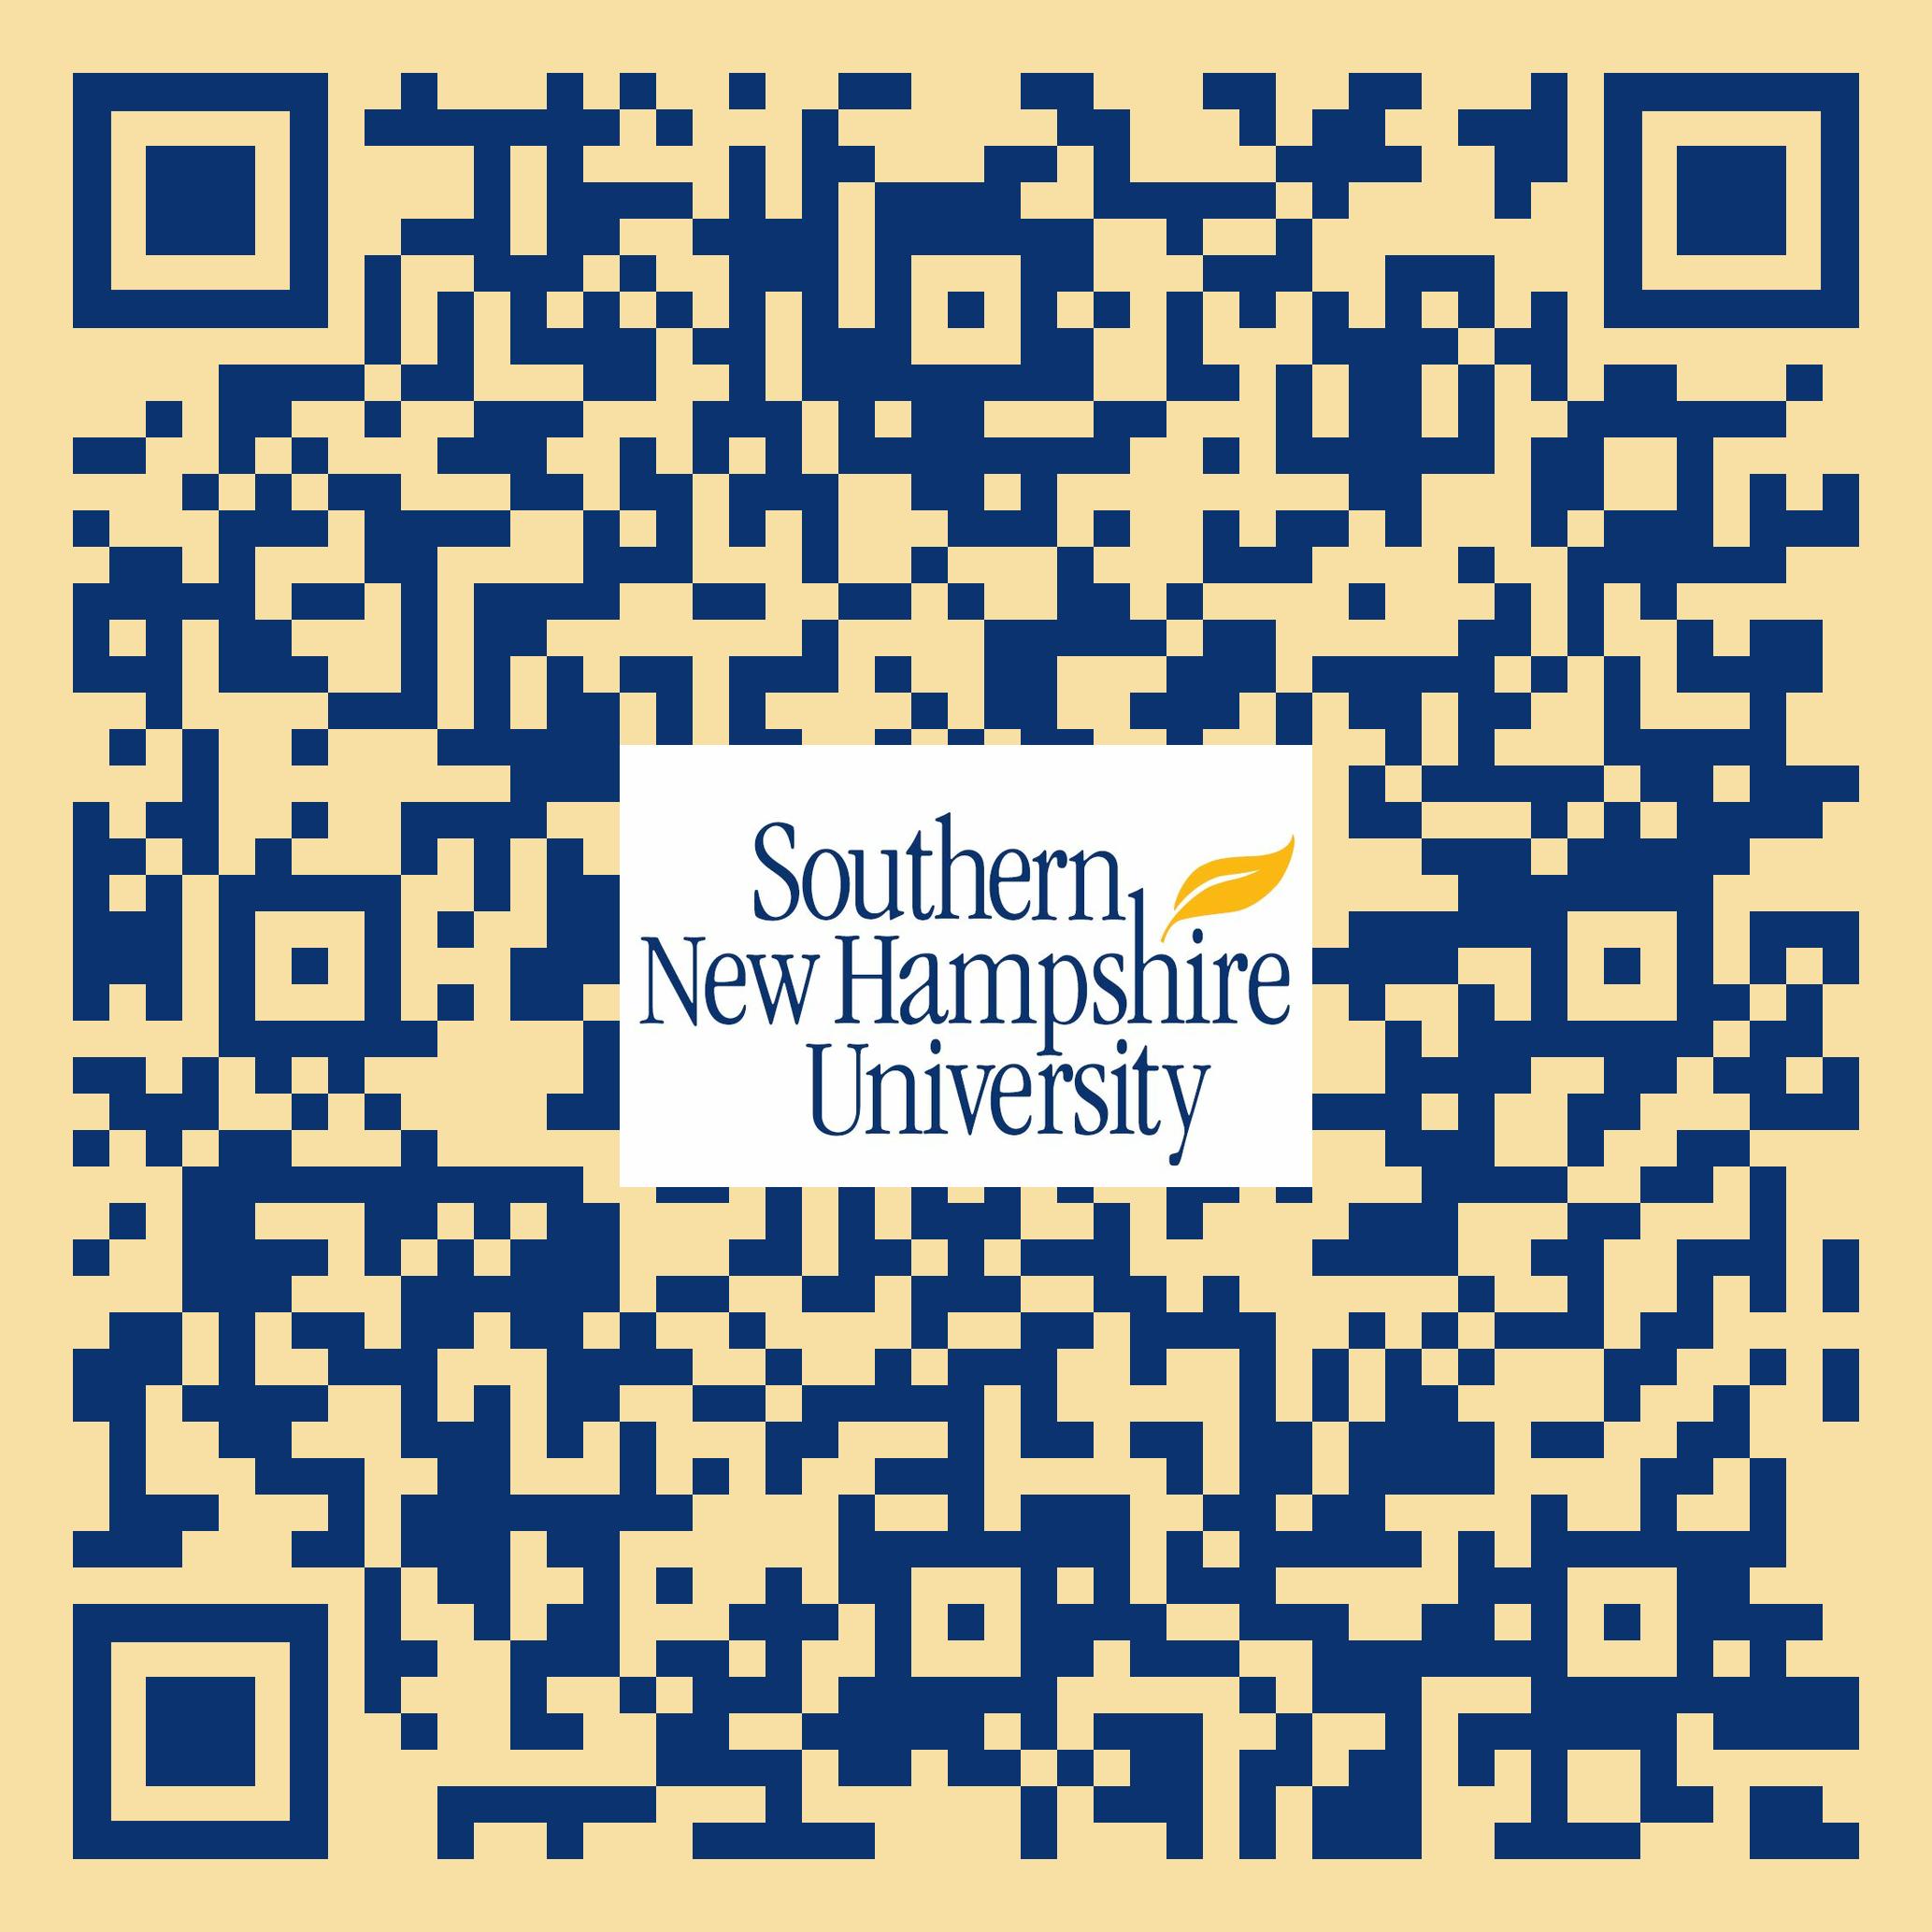 Dark blue & pale yellow QR code with SNHU logo in center